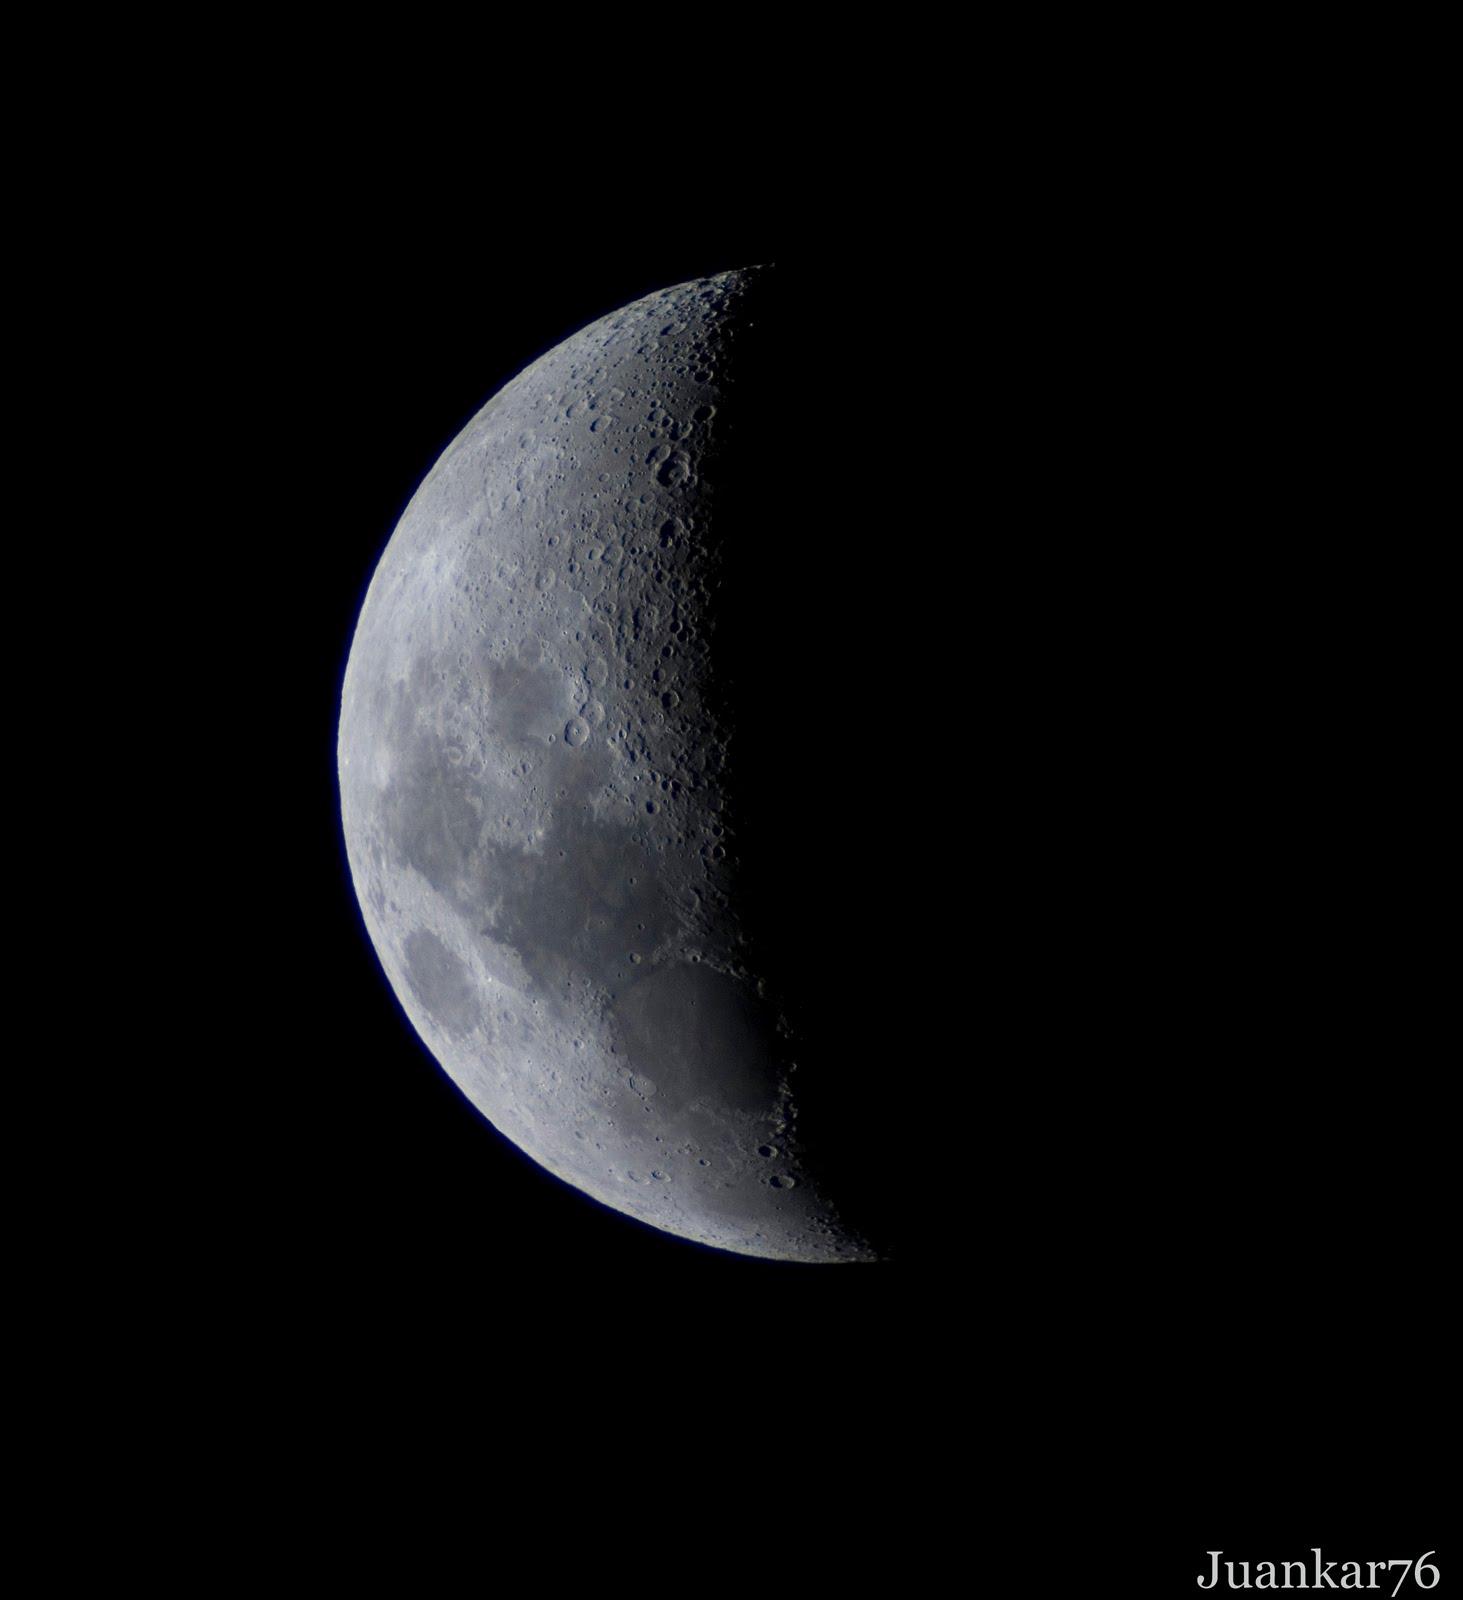 Calendario astron mico lunar para diciembre 2014 Estamos en luna menguante